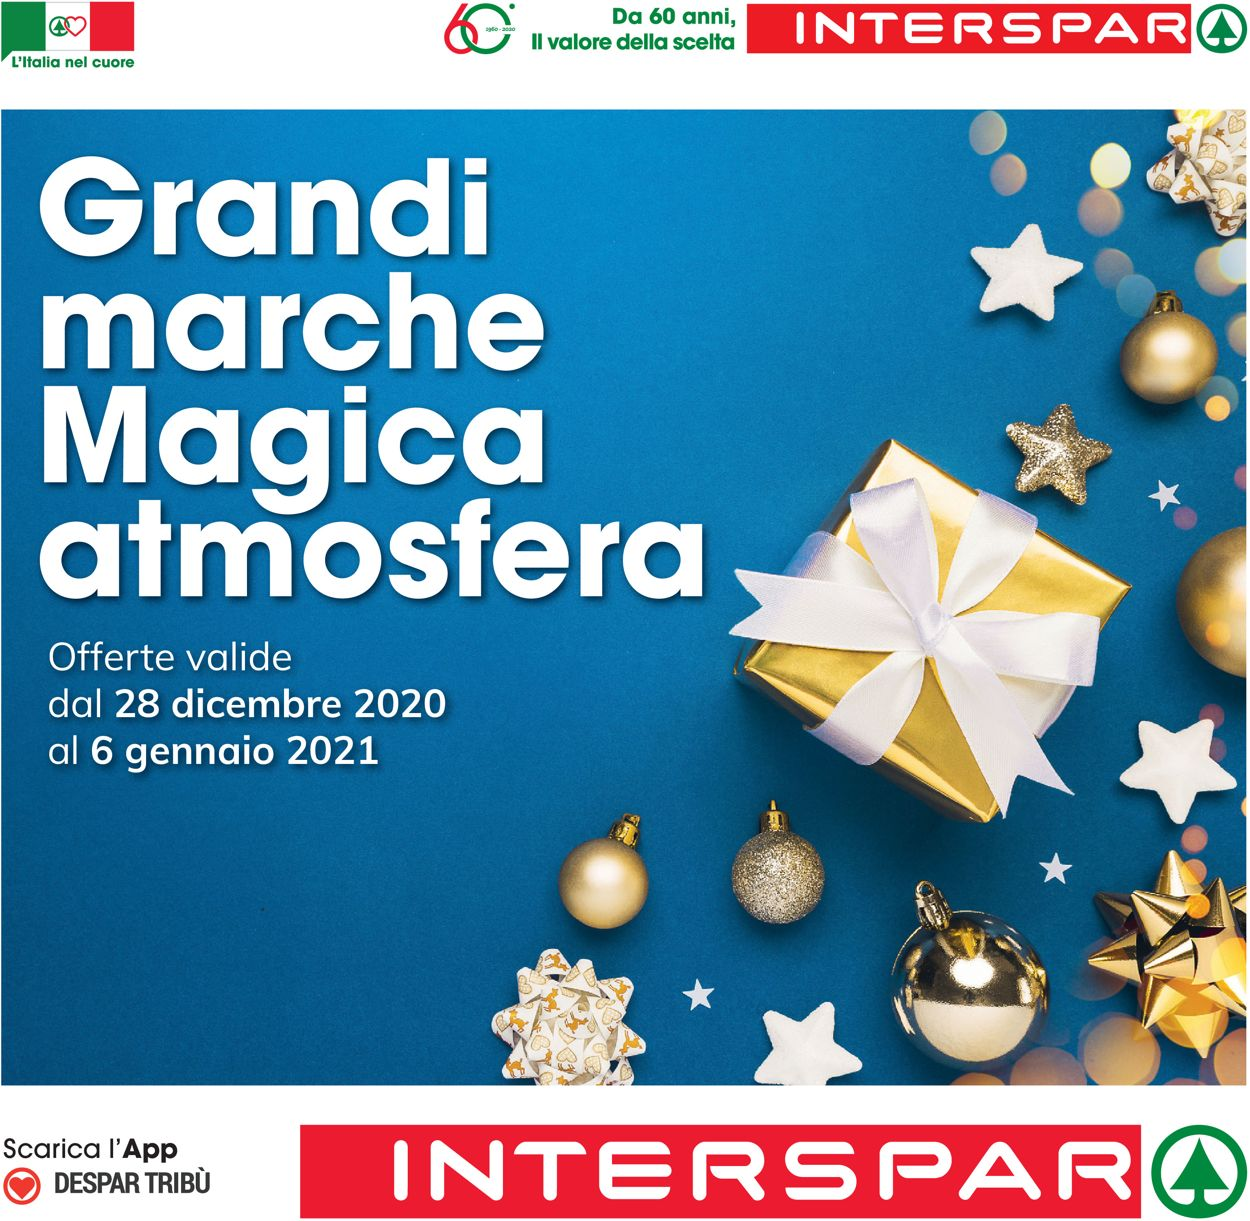 Volantino Eurospar -  Capodanno 2021 - Offerte 28/12-06/01/2021